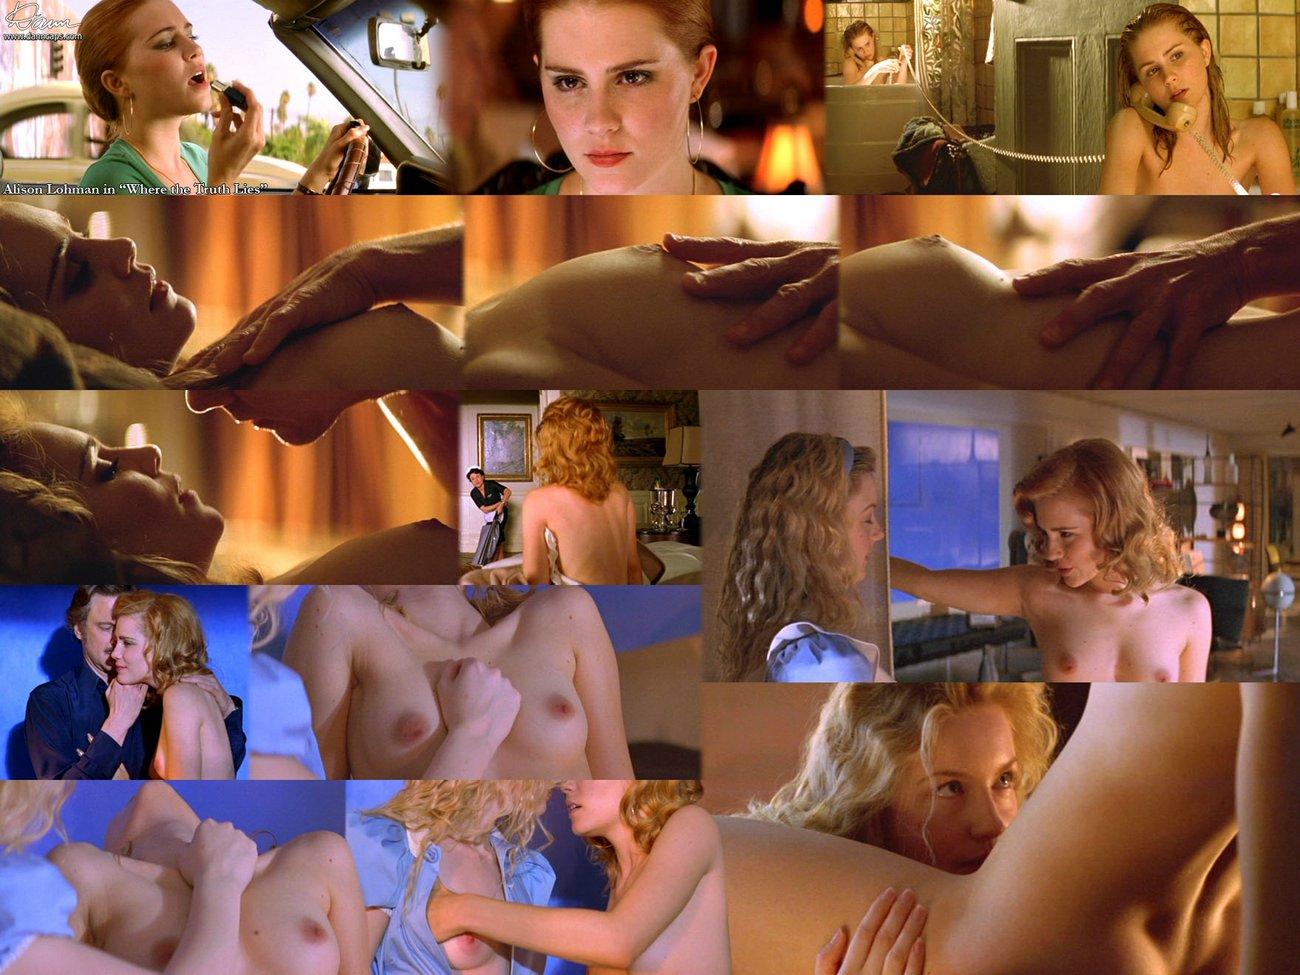 Alison lohman nude pictures